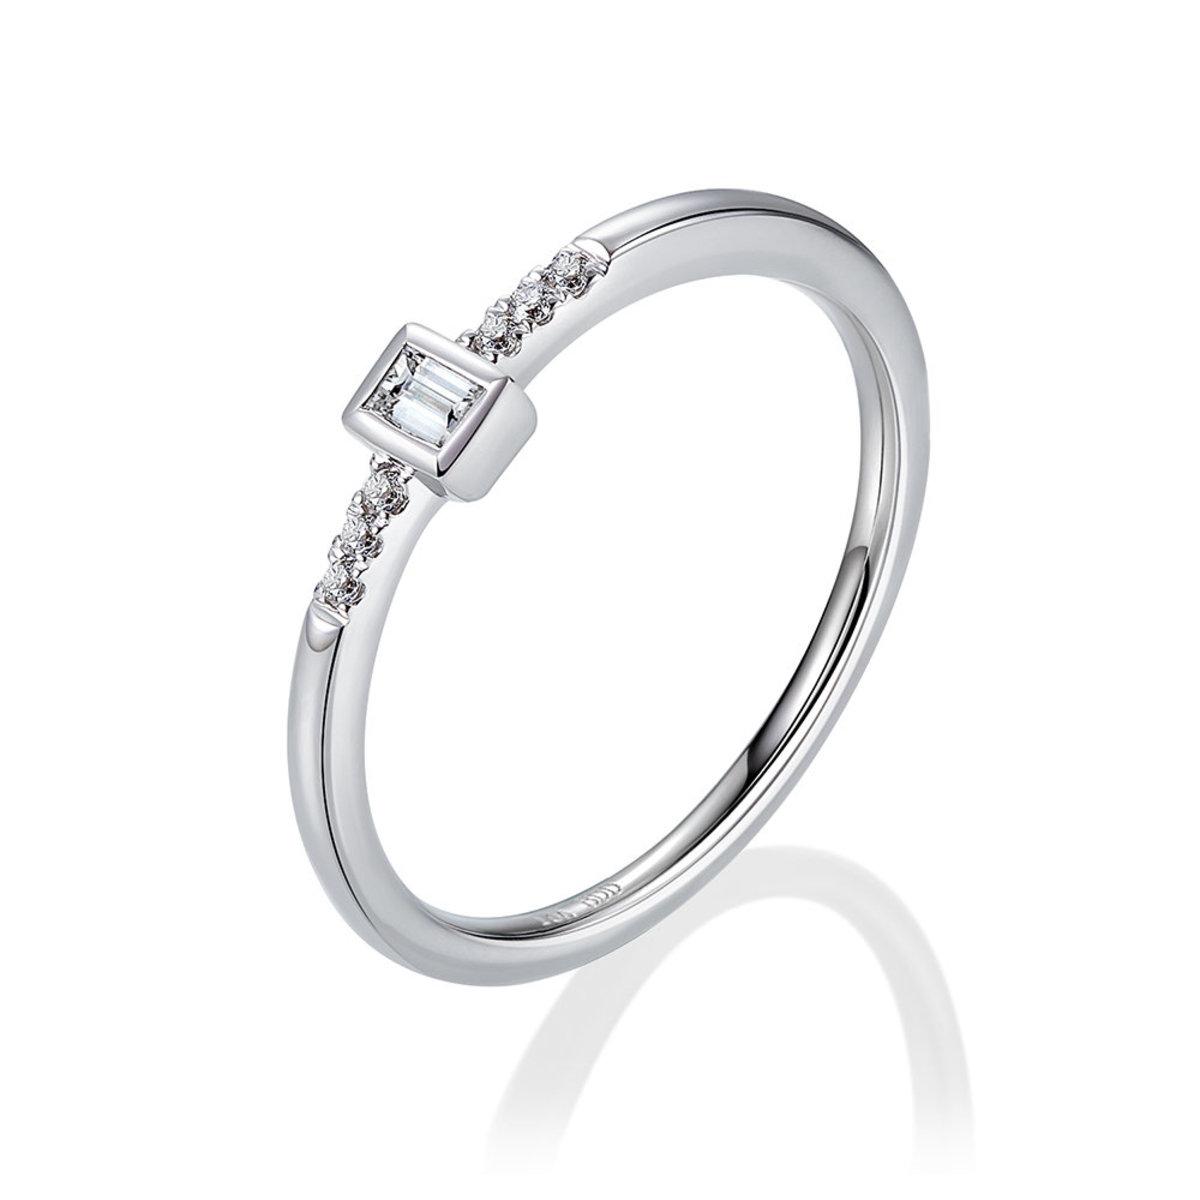 18K White Gold Diamond Ring (0.09 ct. tw.)